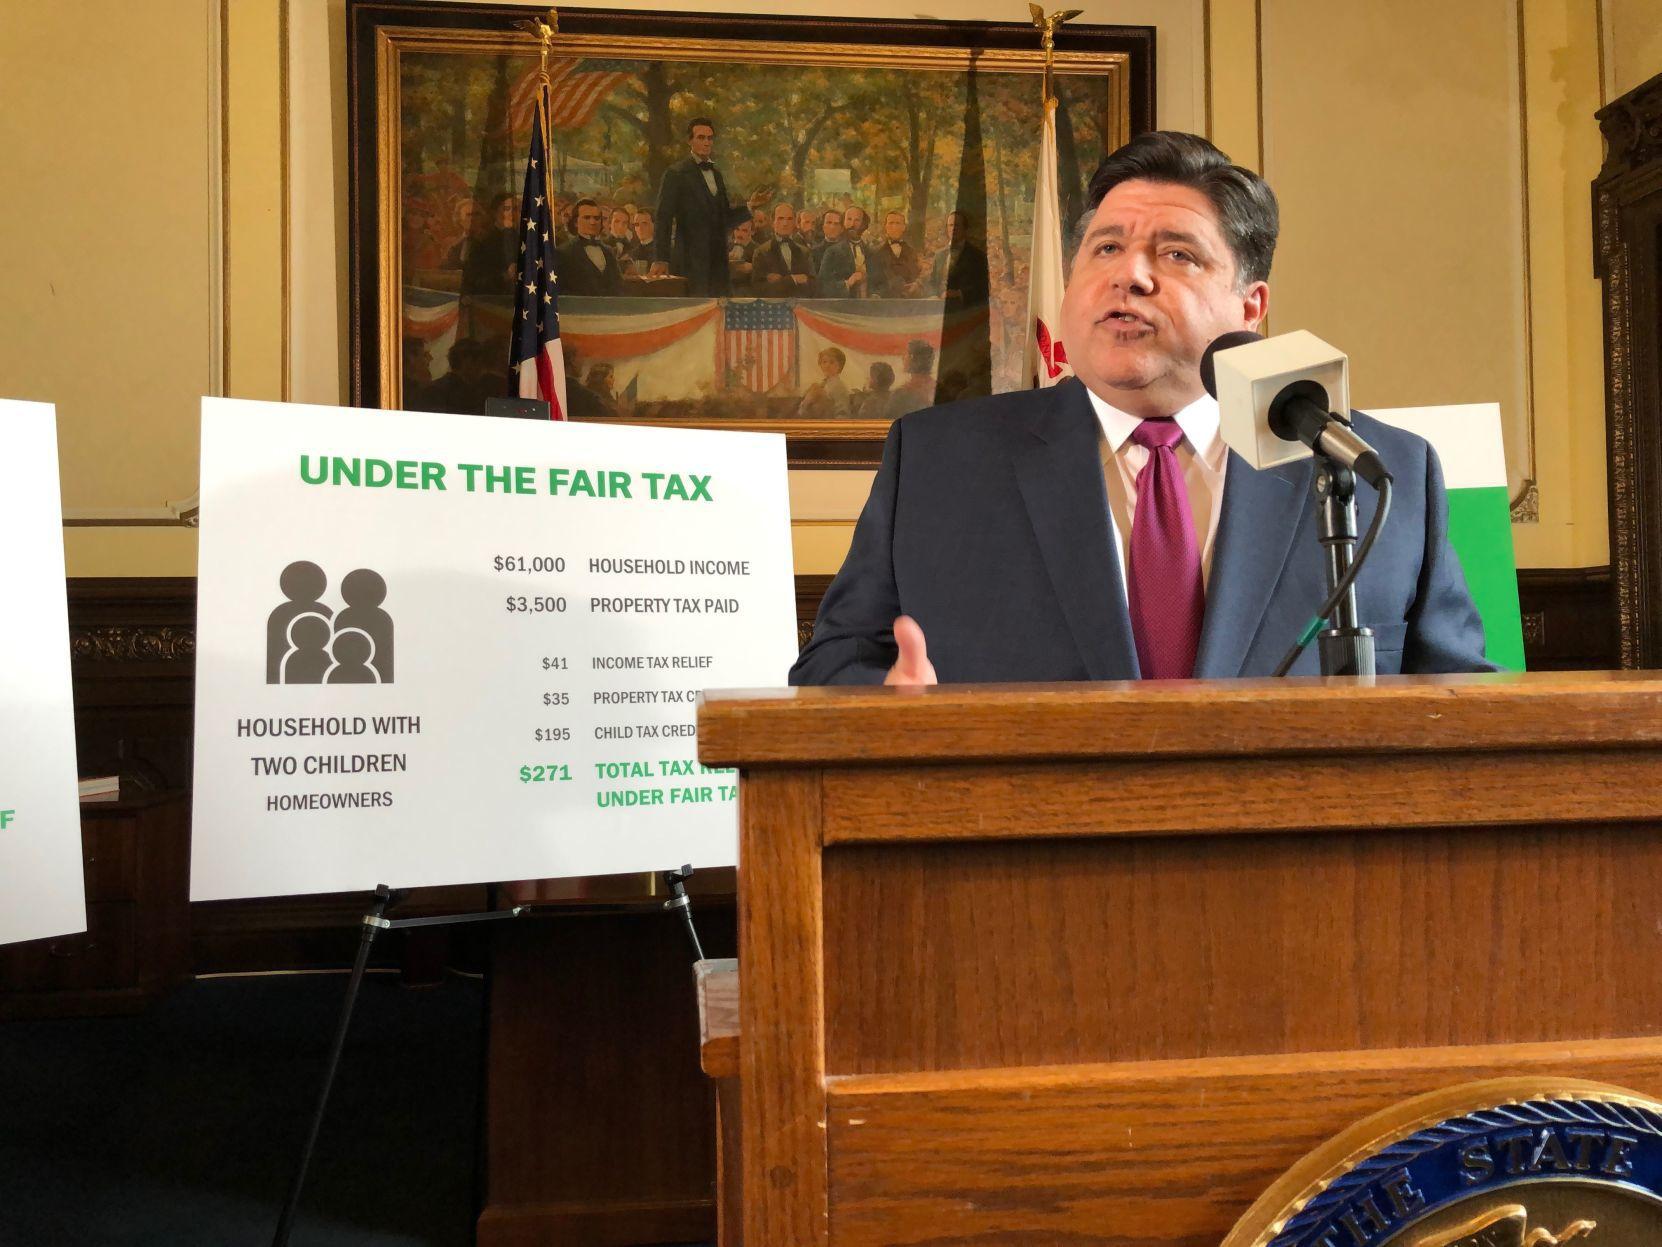 Op-Ed: 'Fair tax' cannot drain enough money to fix Illinois' spending problem